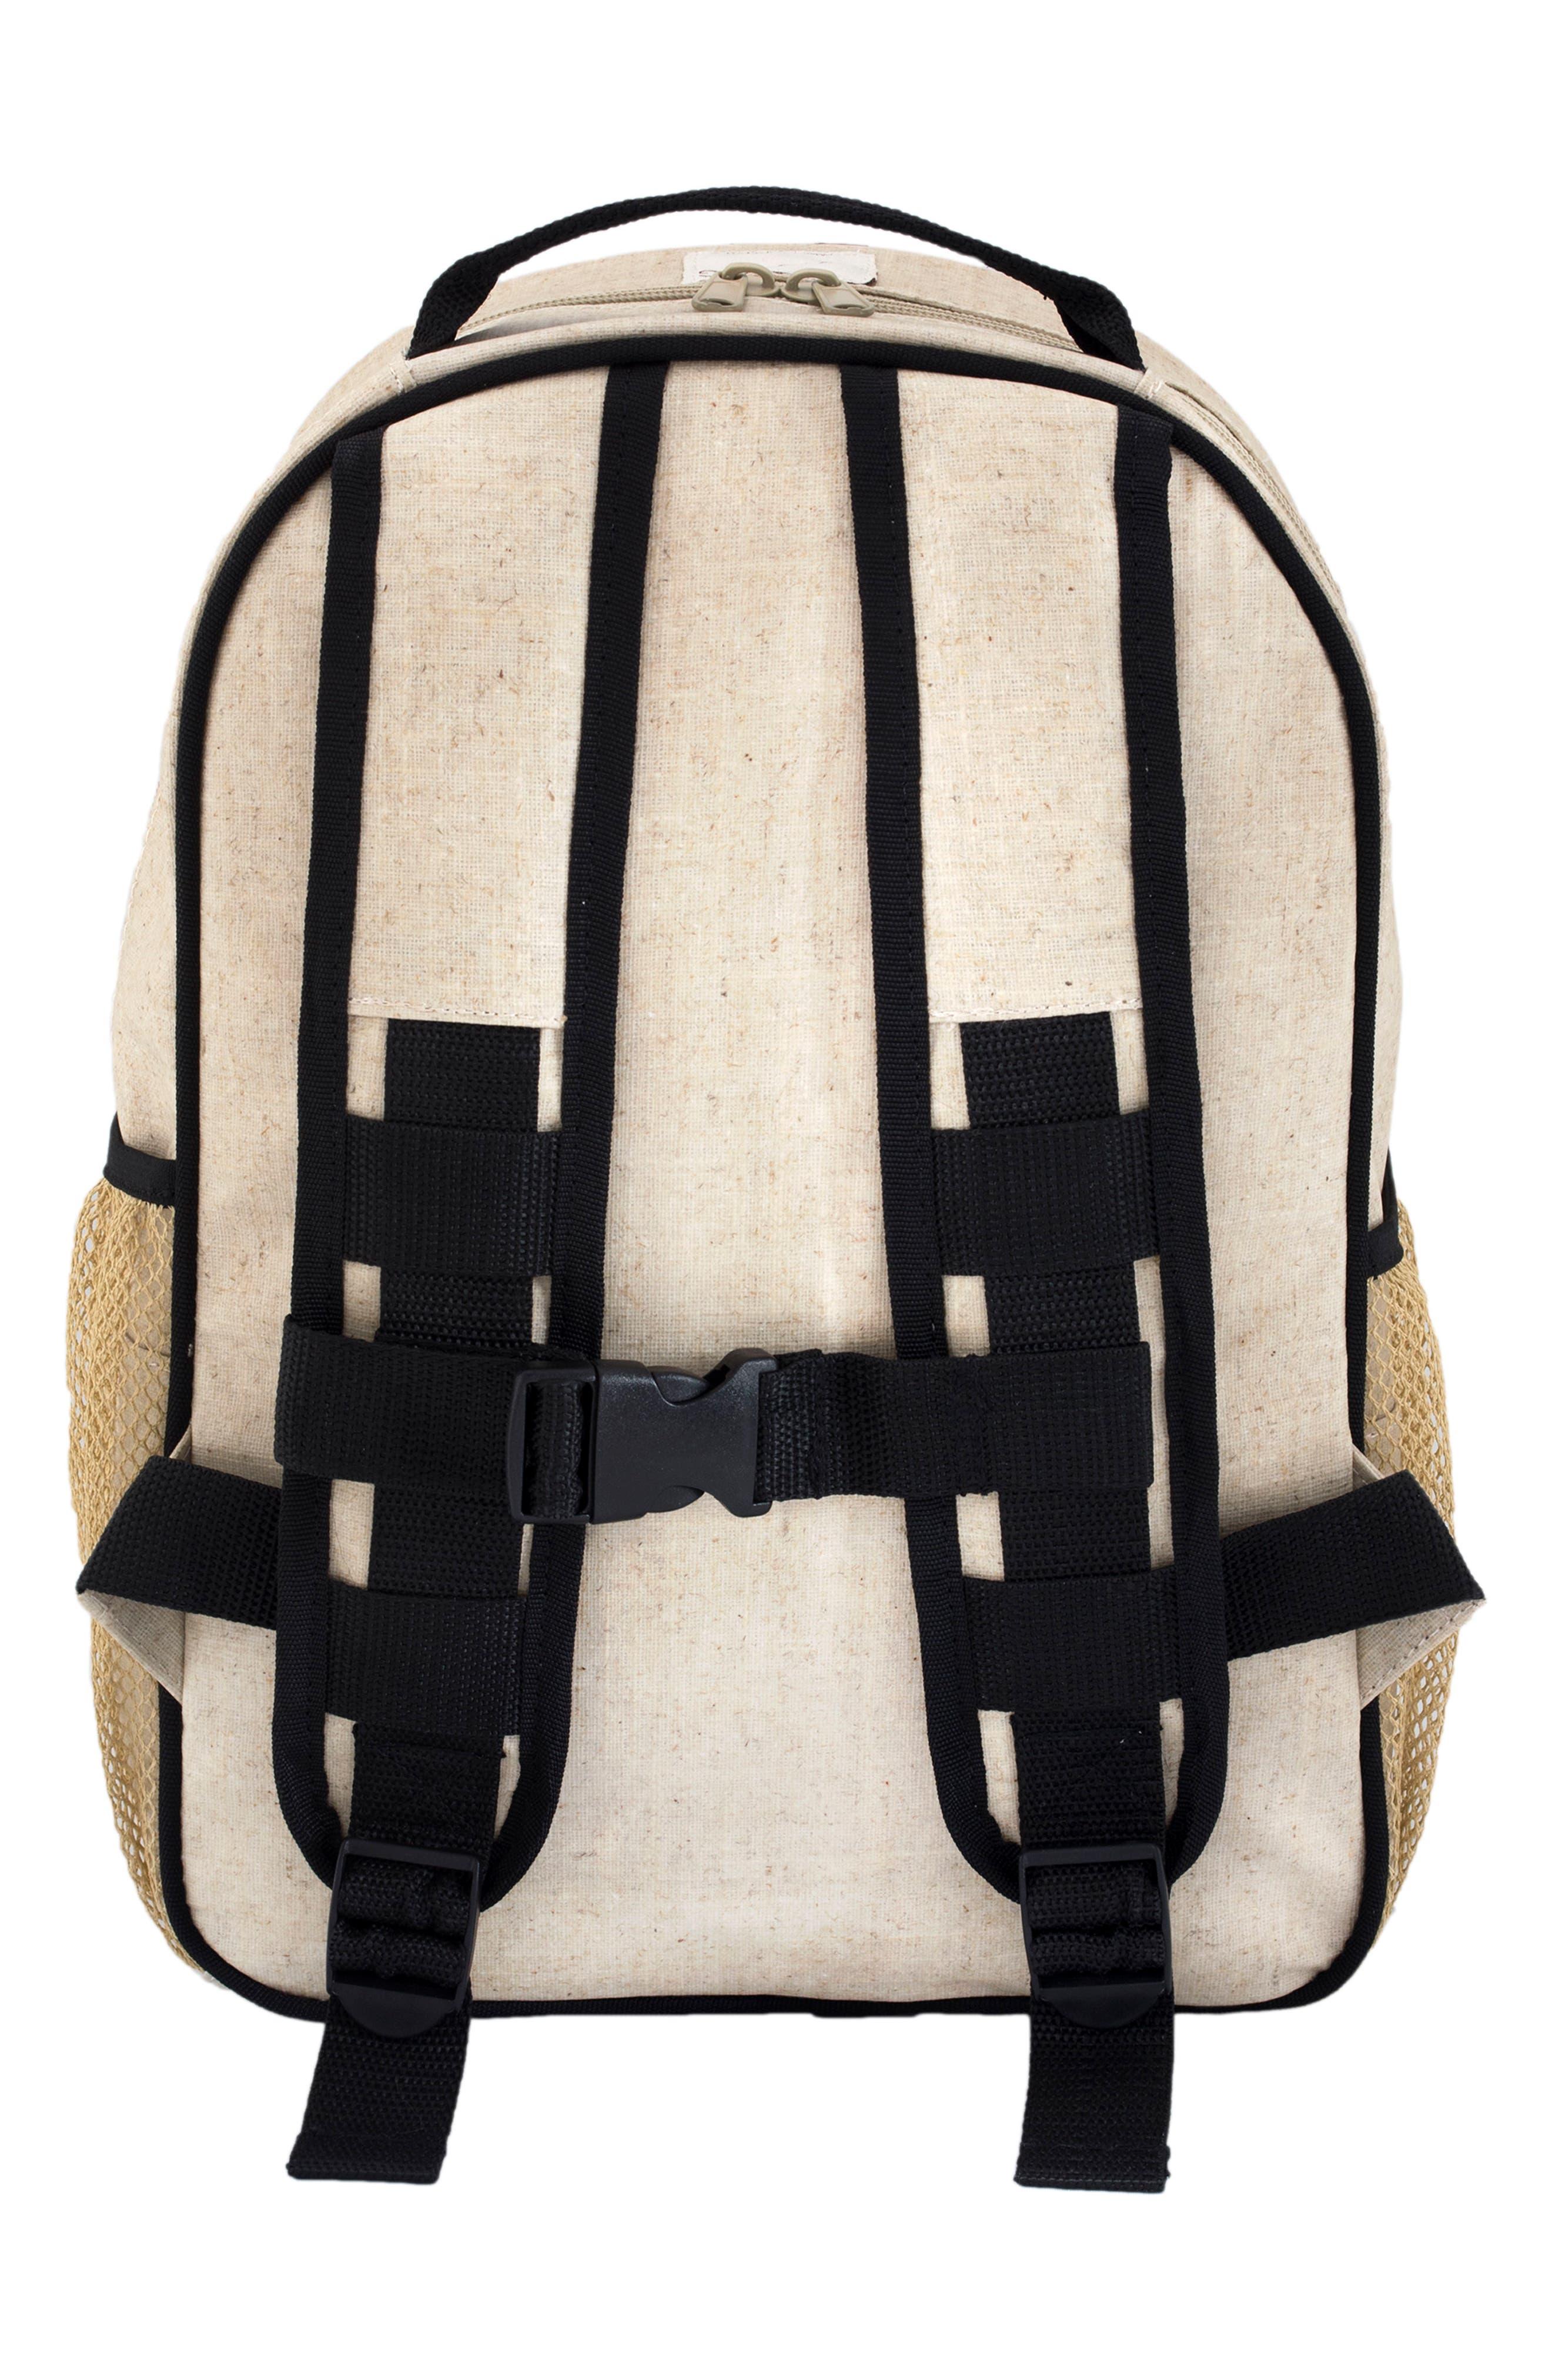 Raw Linen Toddler Backpack,                             Alternate thumbnail 3, color,